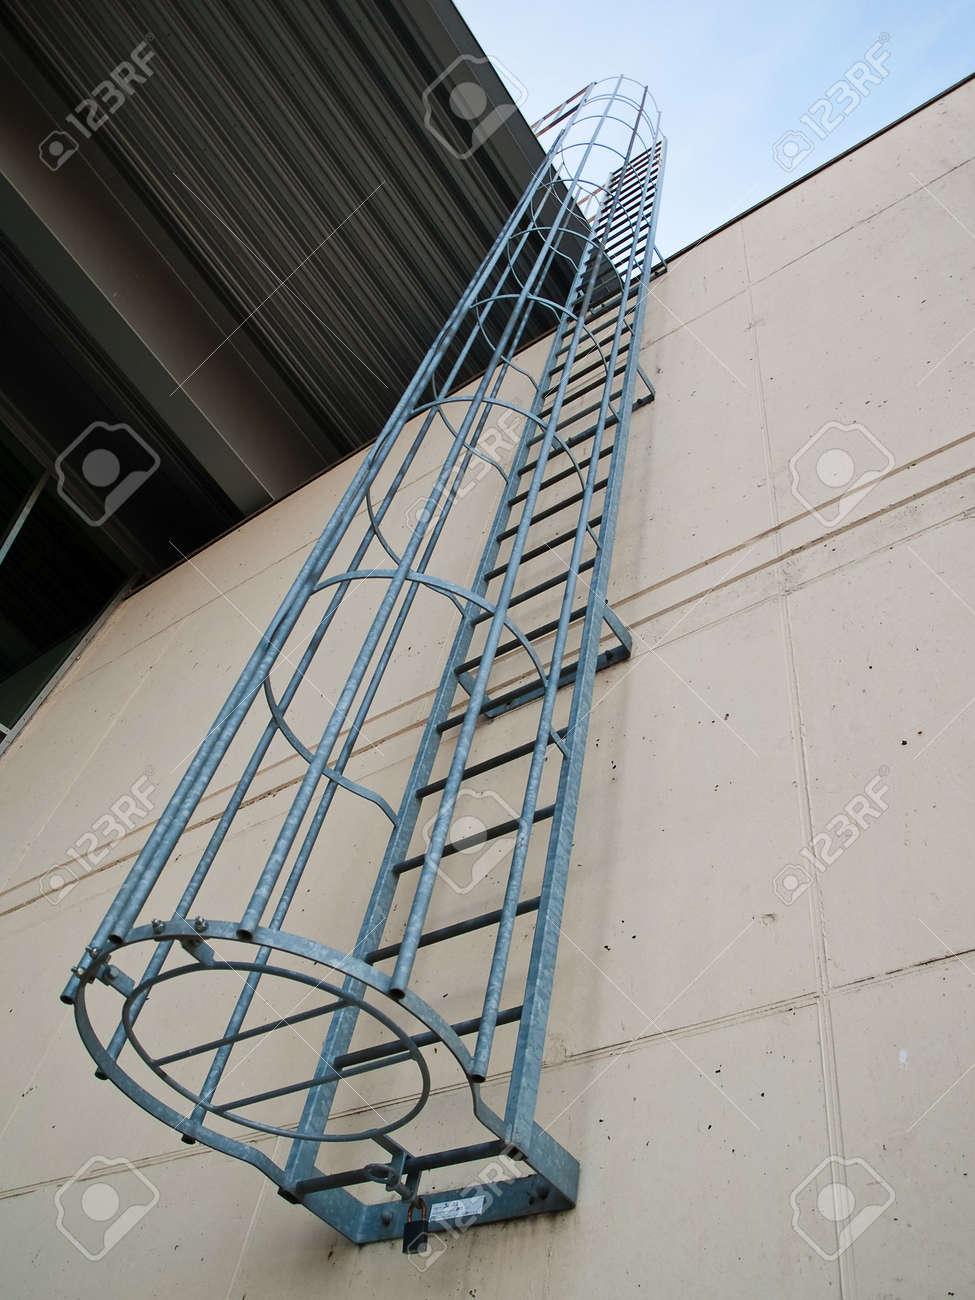 Apartment Building Fire Escape Ladder fire emergency escape ladder on a building vertical angle stock